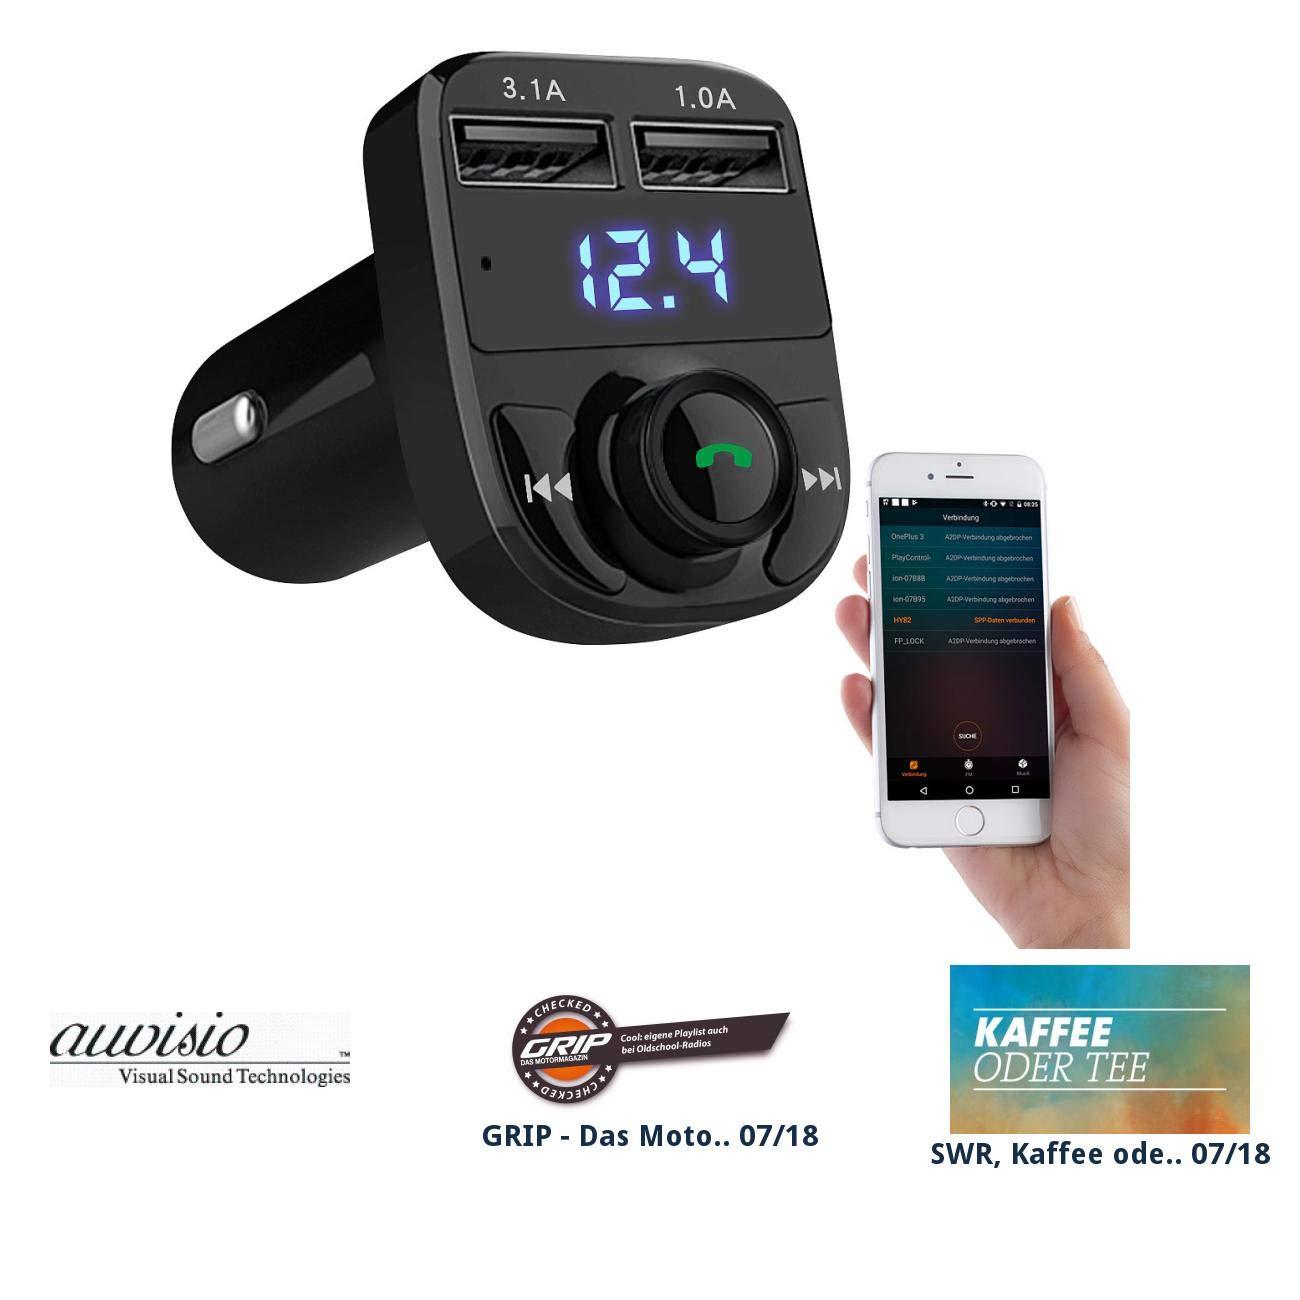 auvisio Auto Transmitter: 3in1-Kfz-FM-Transmitter, Freisprecher m. Bluetooth, Ladegerä t, mit App (USB Transmitter)